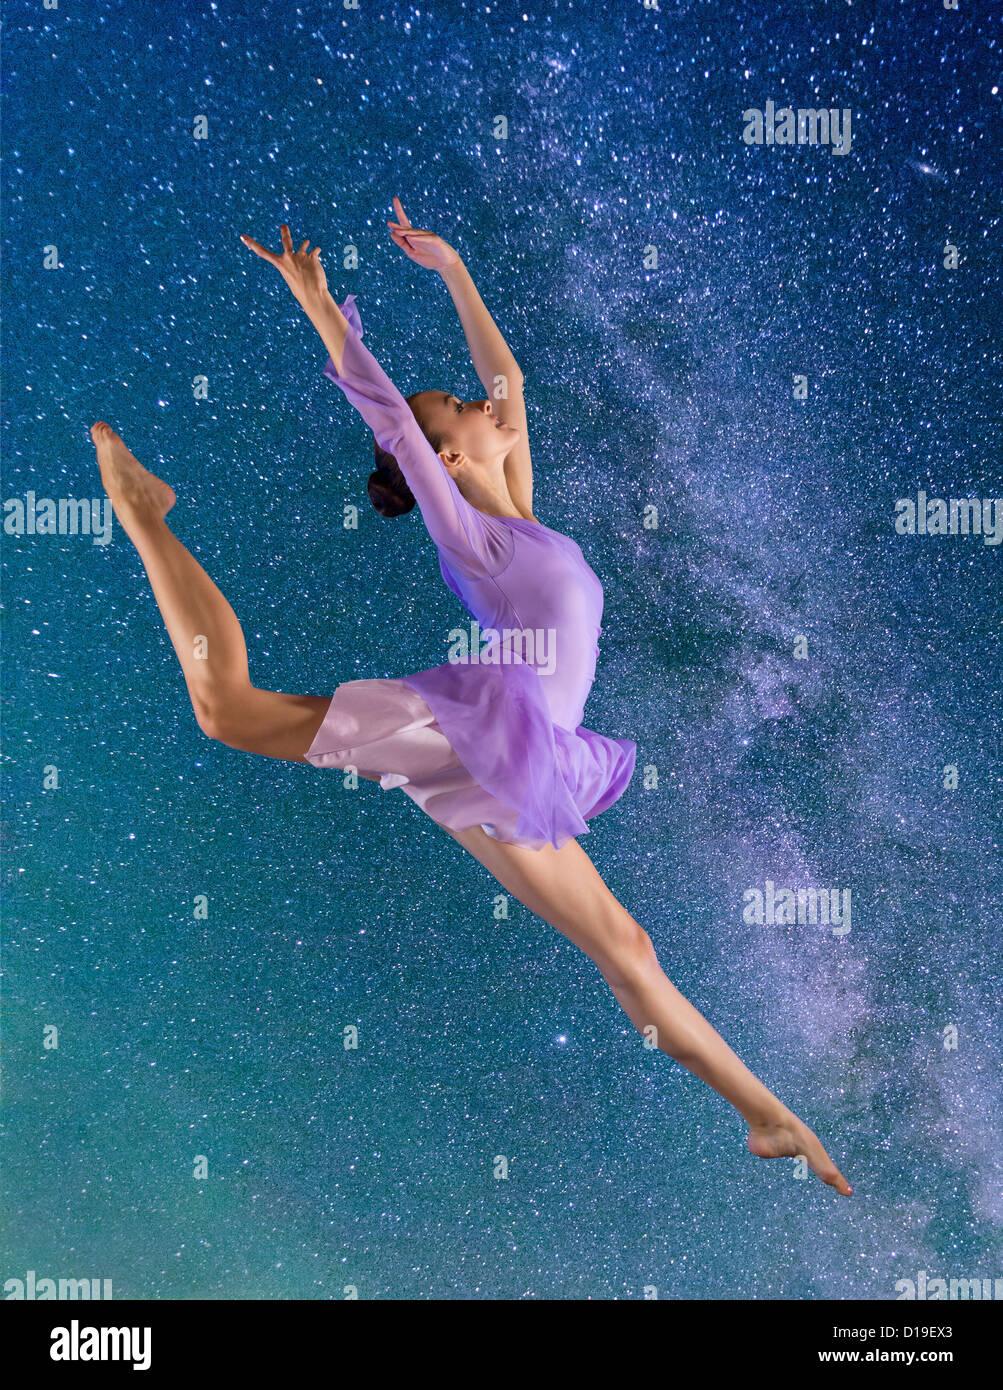 Ballerina leaping against starry night sky - Stock Image